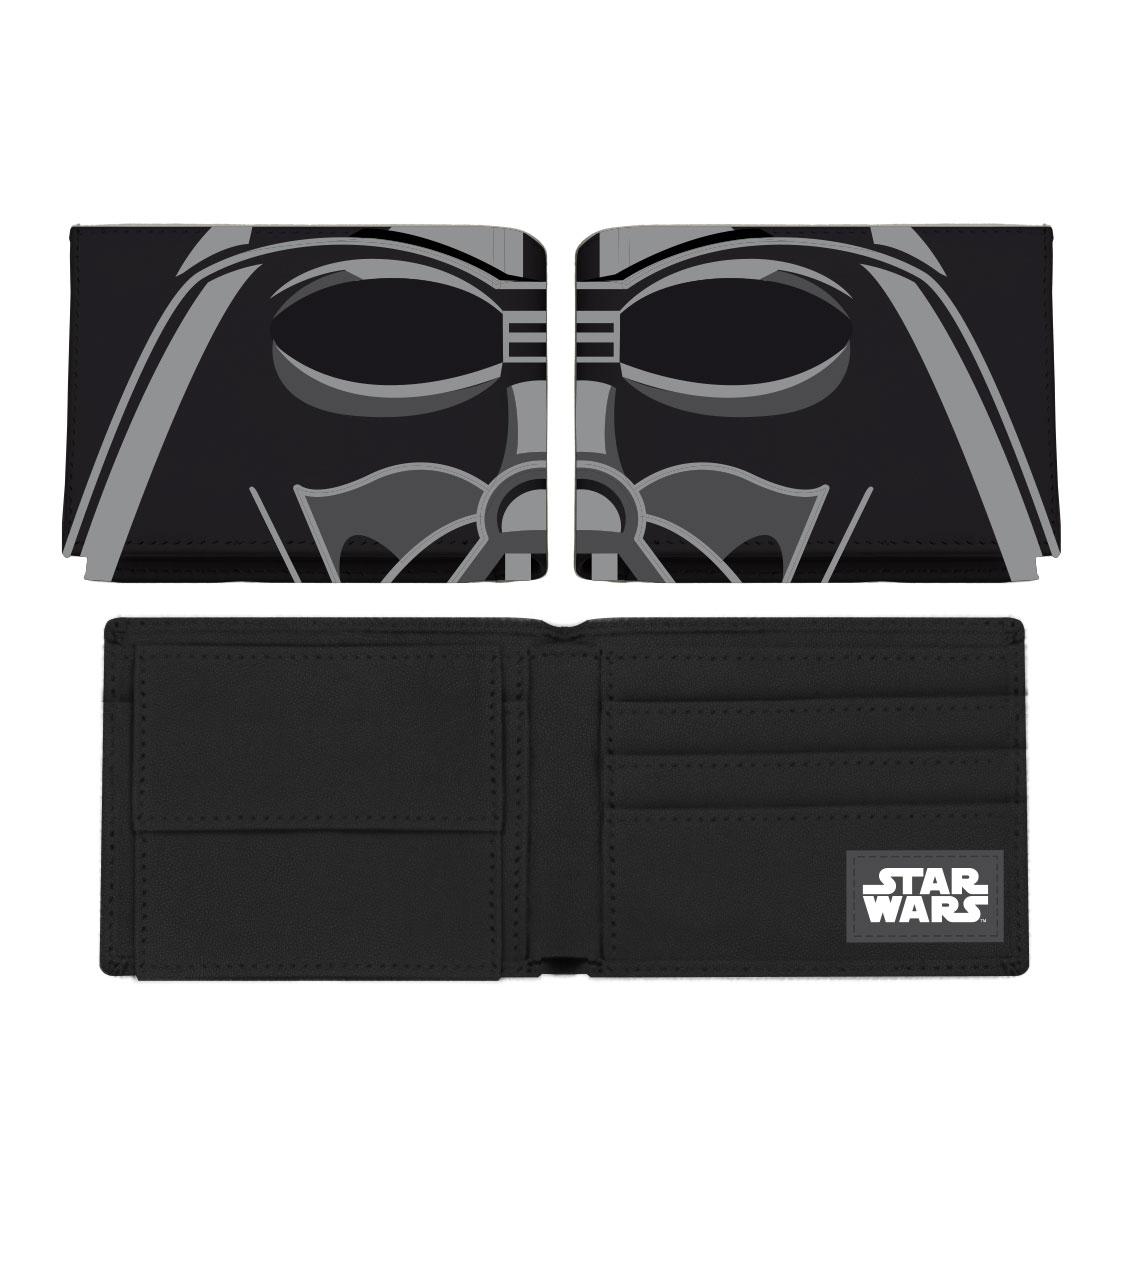 Star Wars Episode VIII Wallet Darth Vader